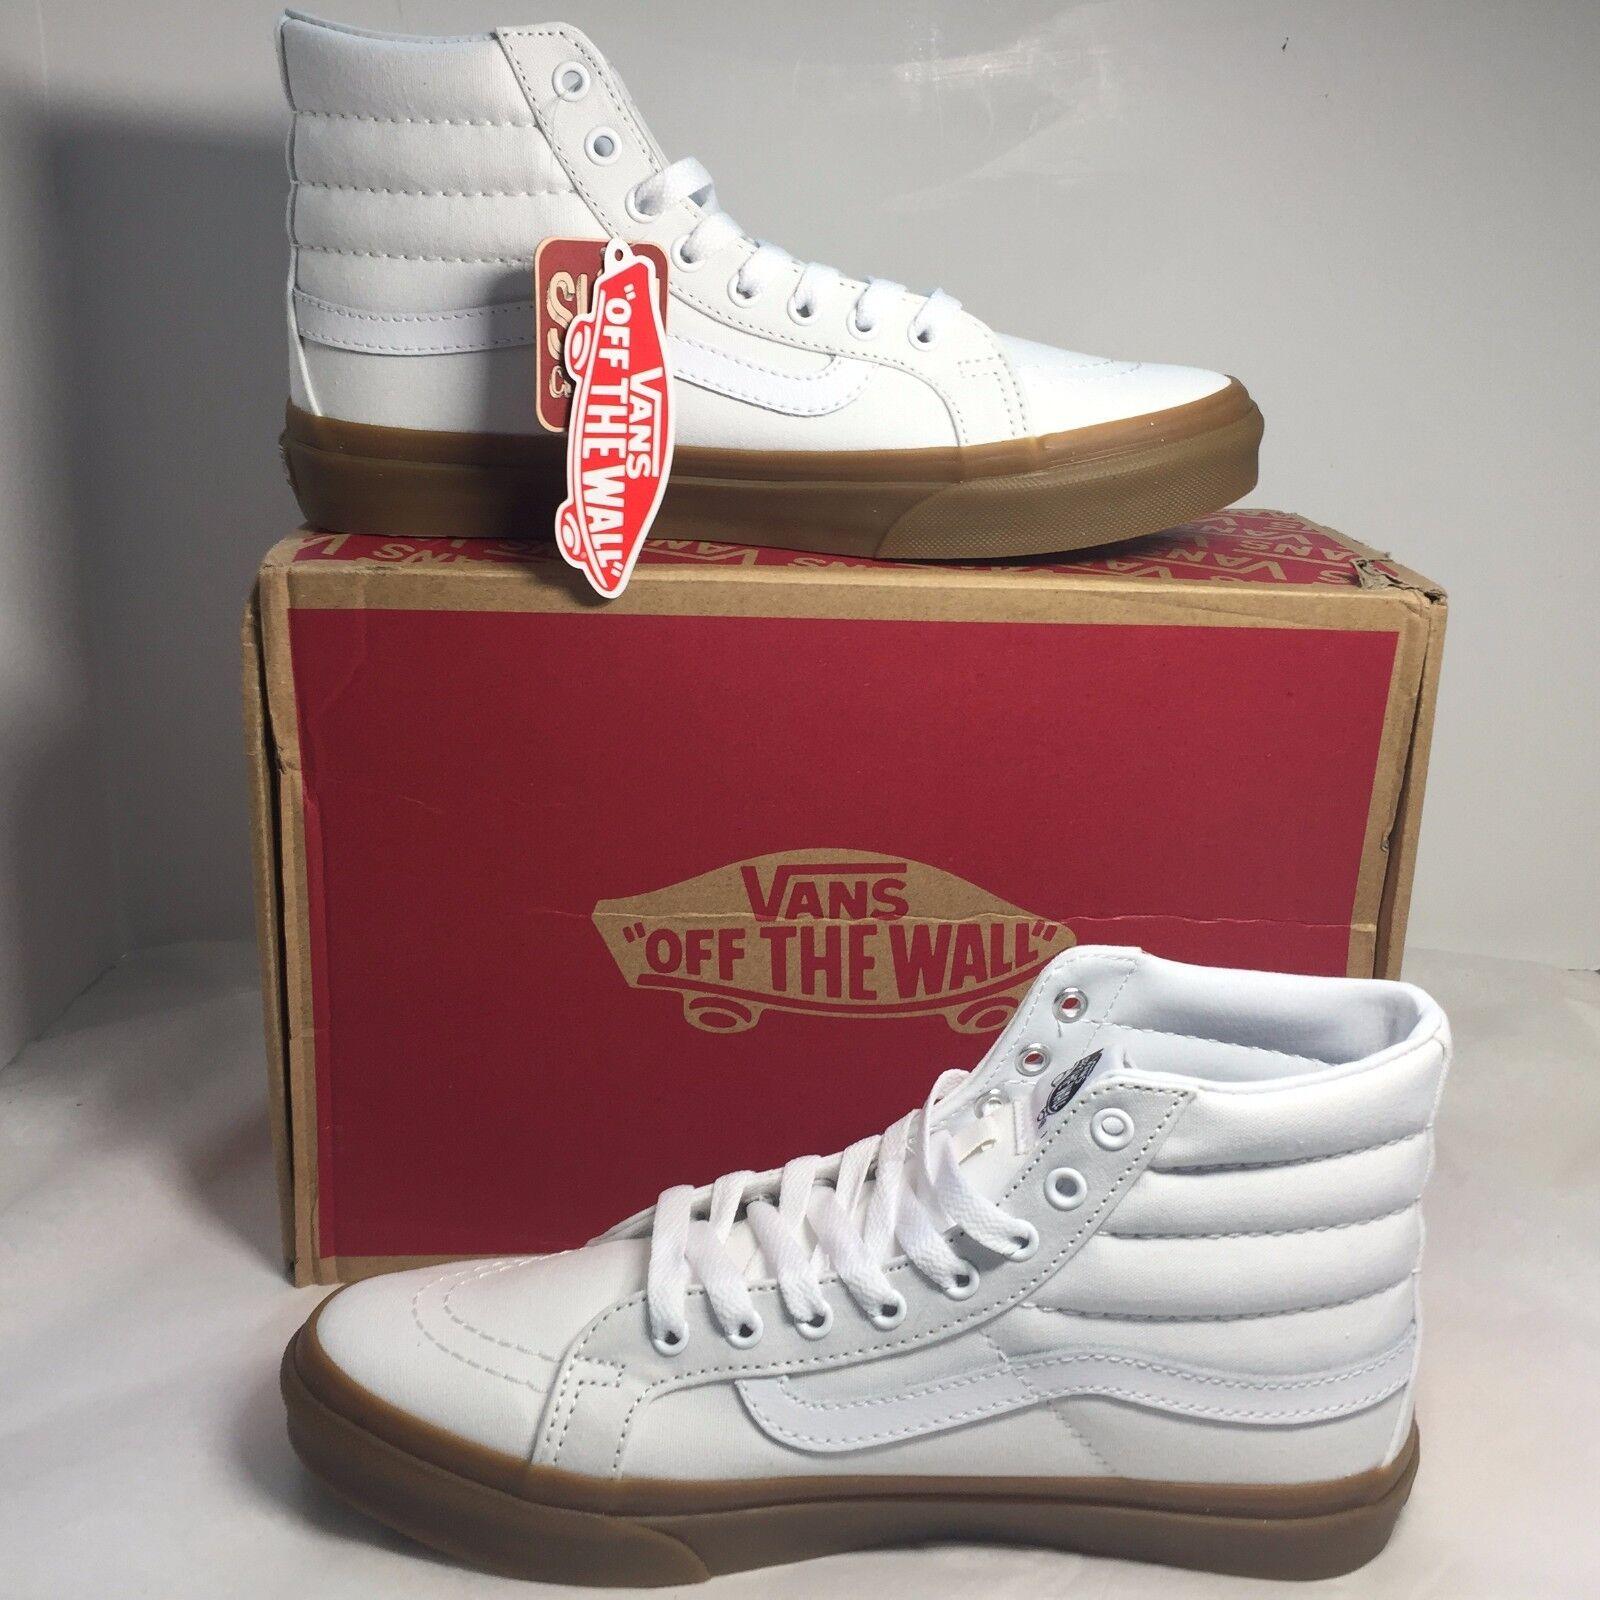 Vans Sk8 Hi Slim Light Gum True White VN0A32R2LPU Womens 9 Mens 7.5